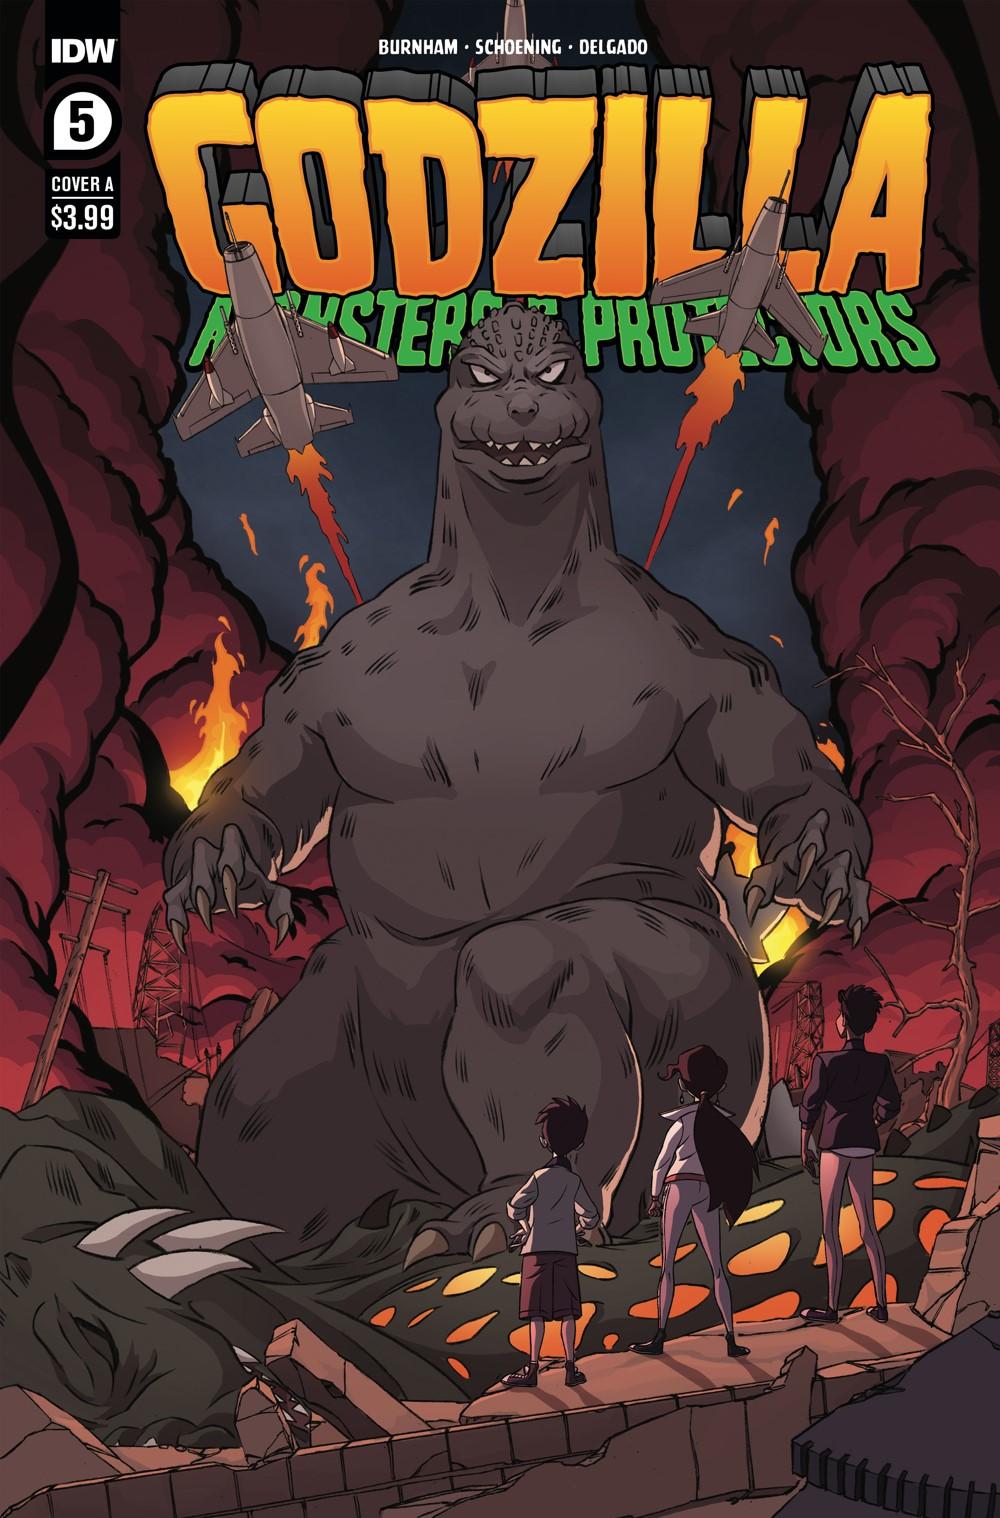 Godzilla_MP05-coverA ComicList: IDW Publishing New Releases for 08/18/2021